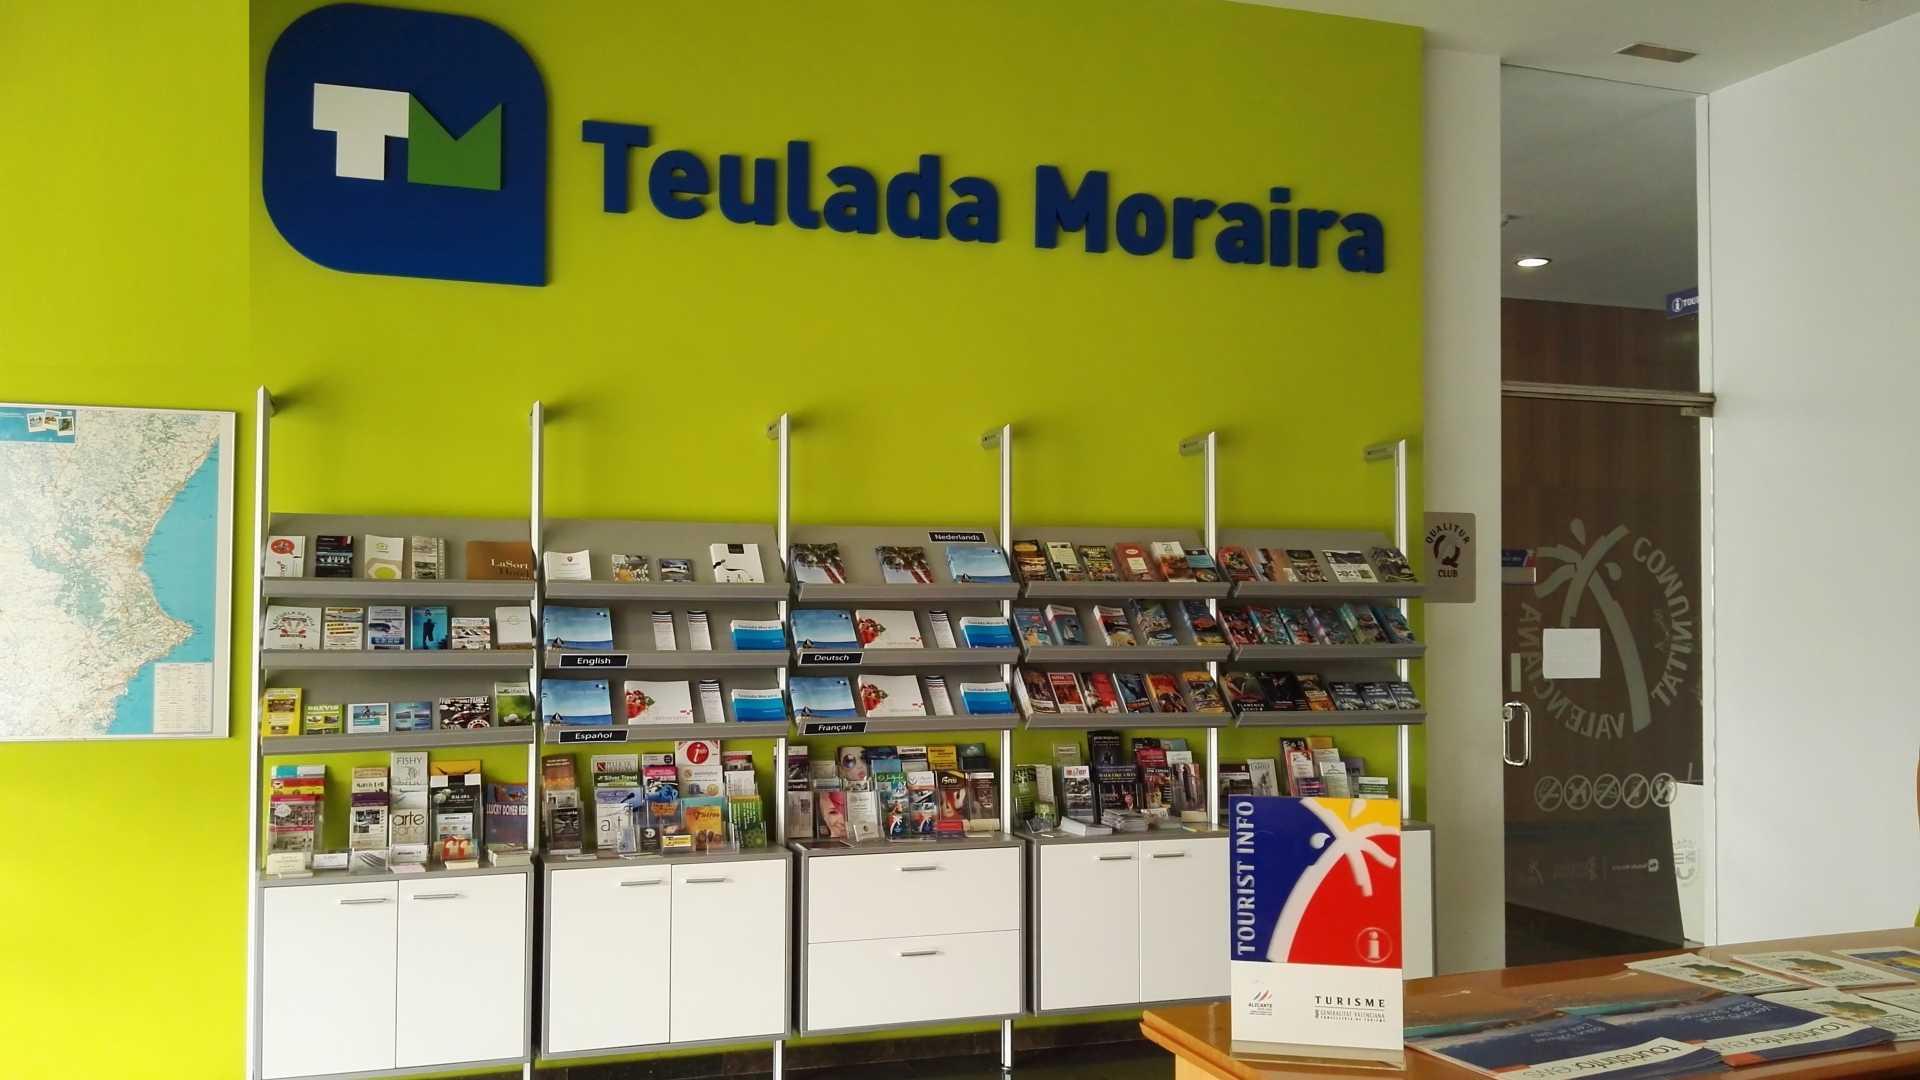 TOURIST INFO TEULADA MORAIRA